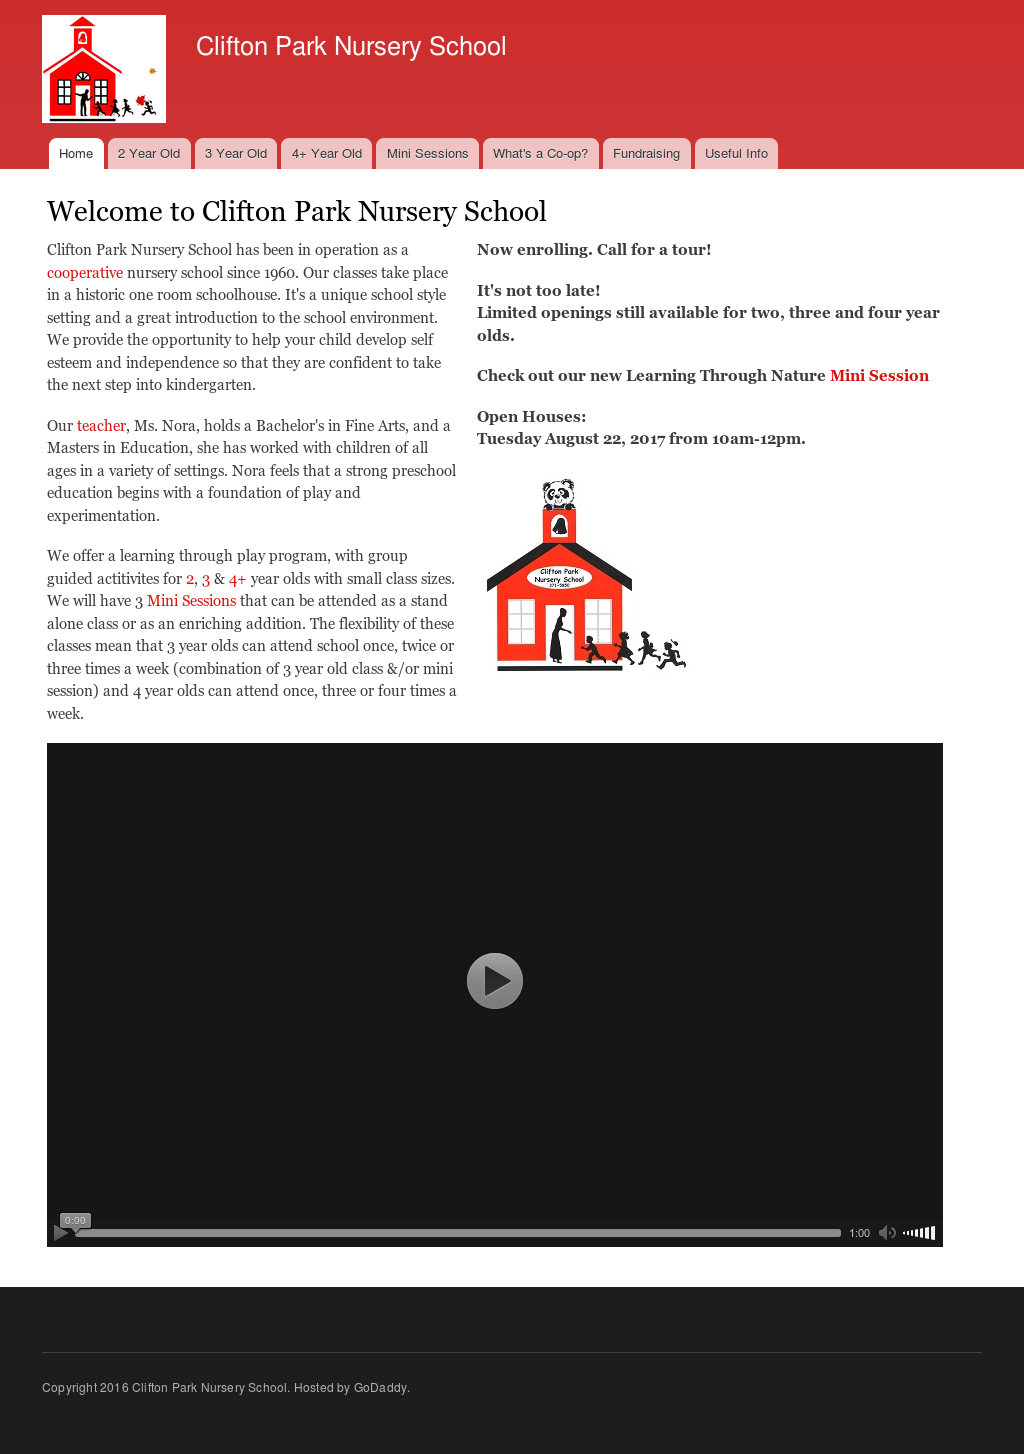 Clifton Park Nursery School Website History